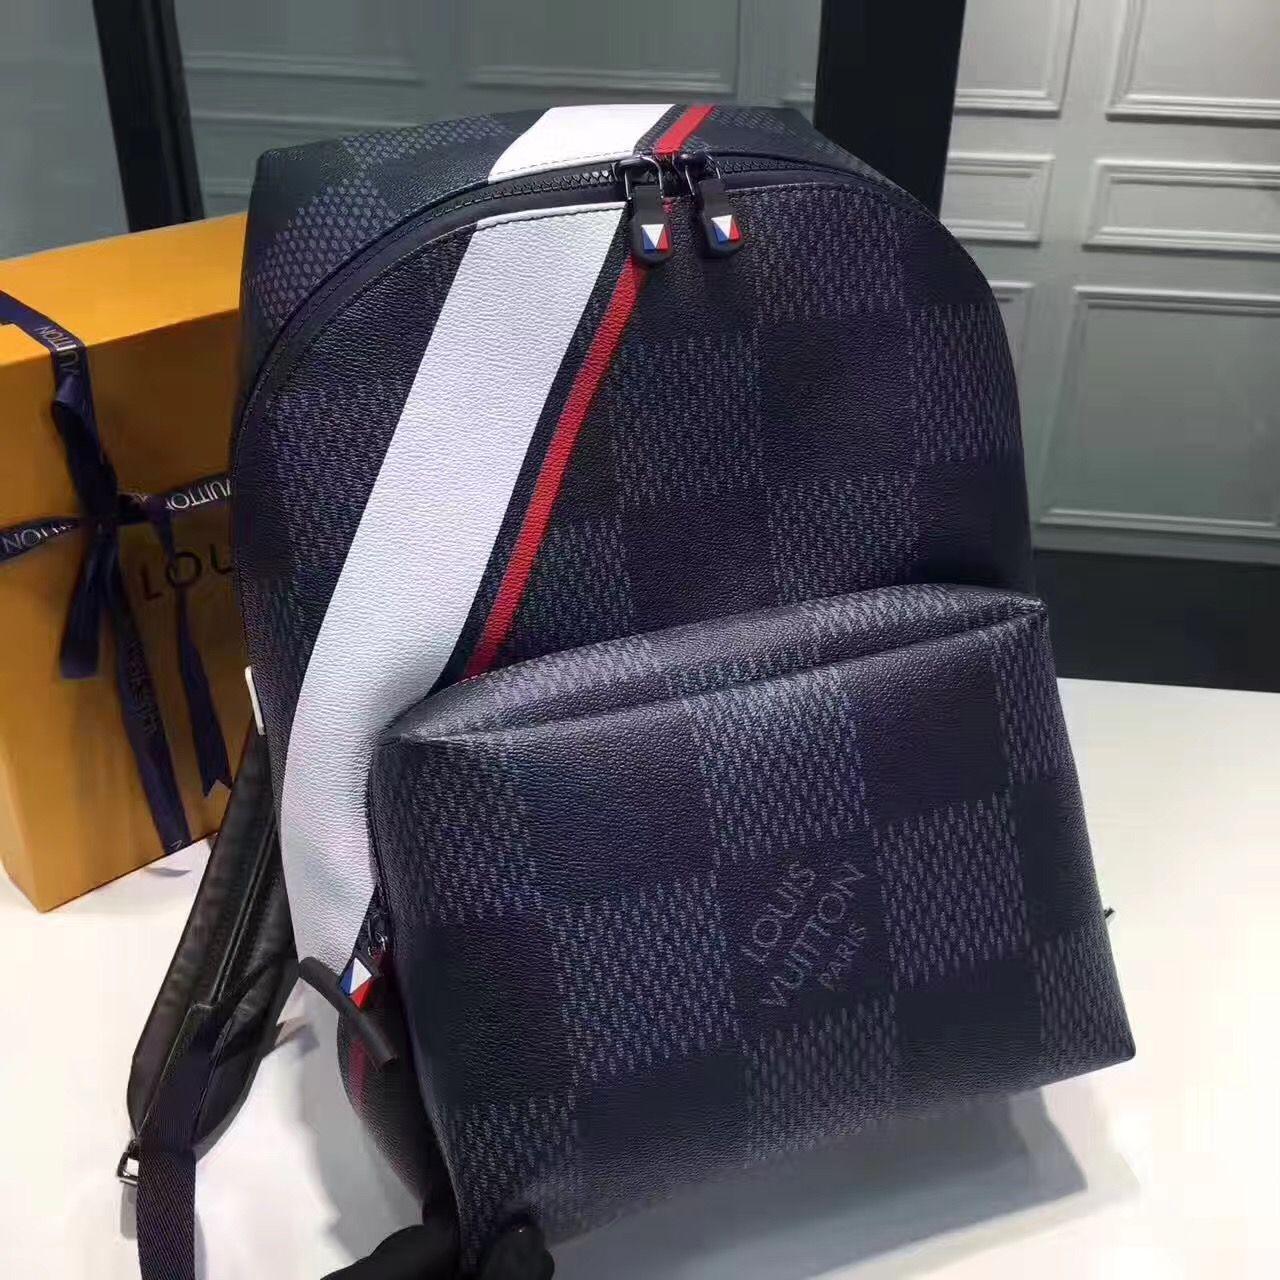 2f31fca1a4 Louis Vuitton lv man backpack shoulders bag original leather